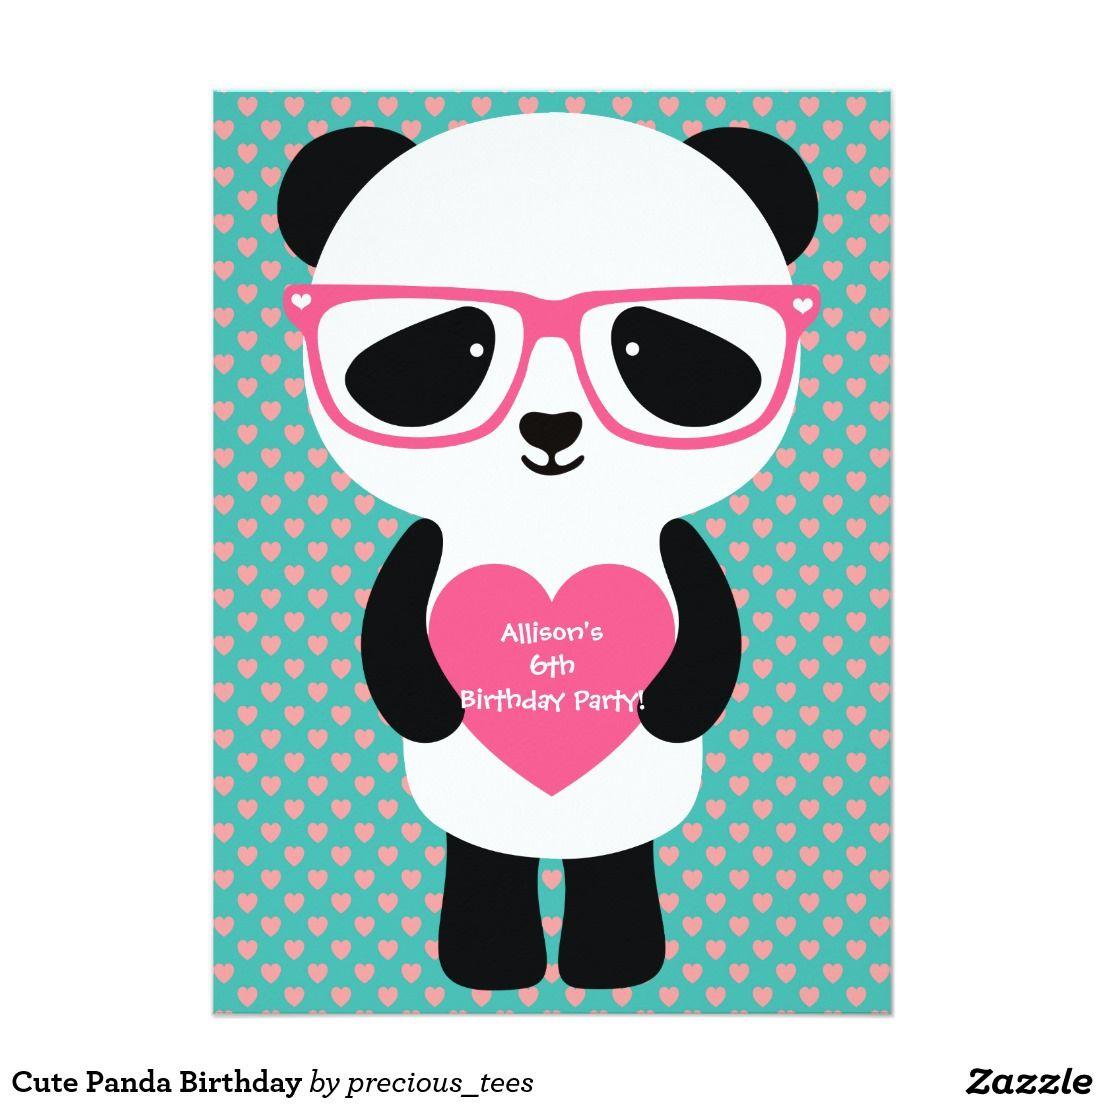 Cute Panda Birthday Invitation   Pinterest   Panda birthday, Panda ...